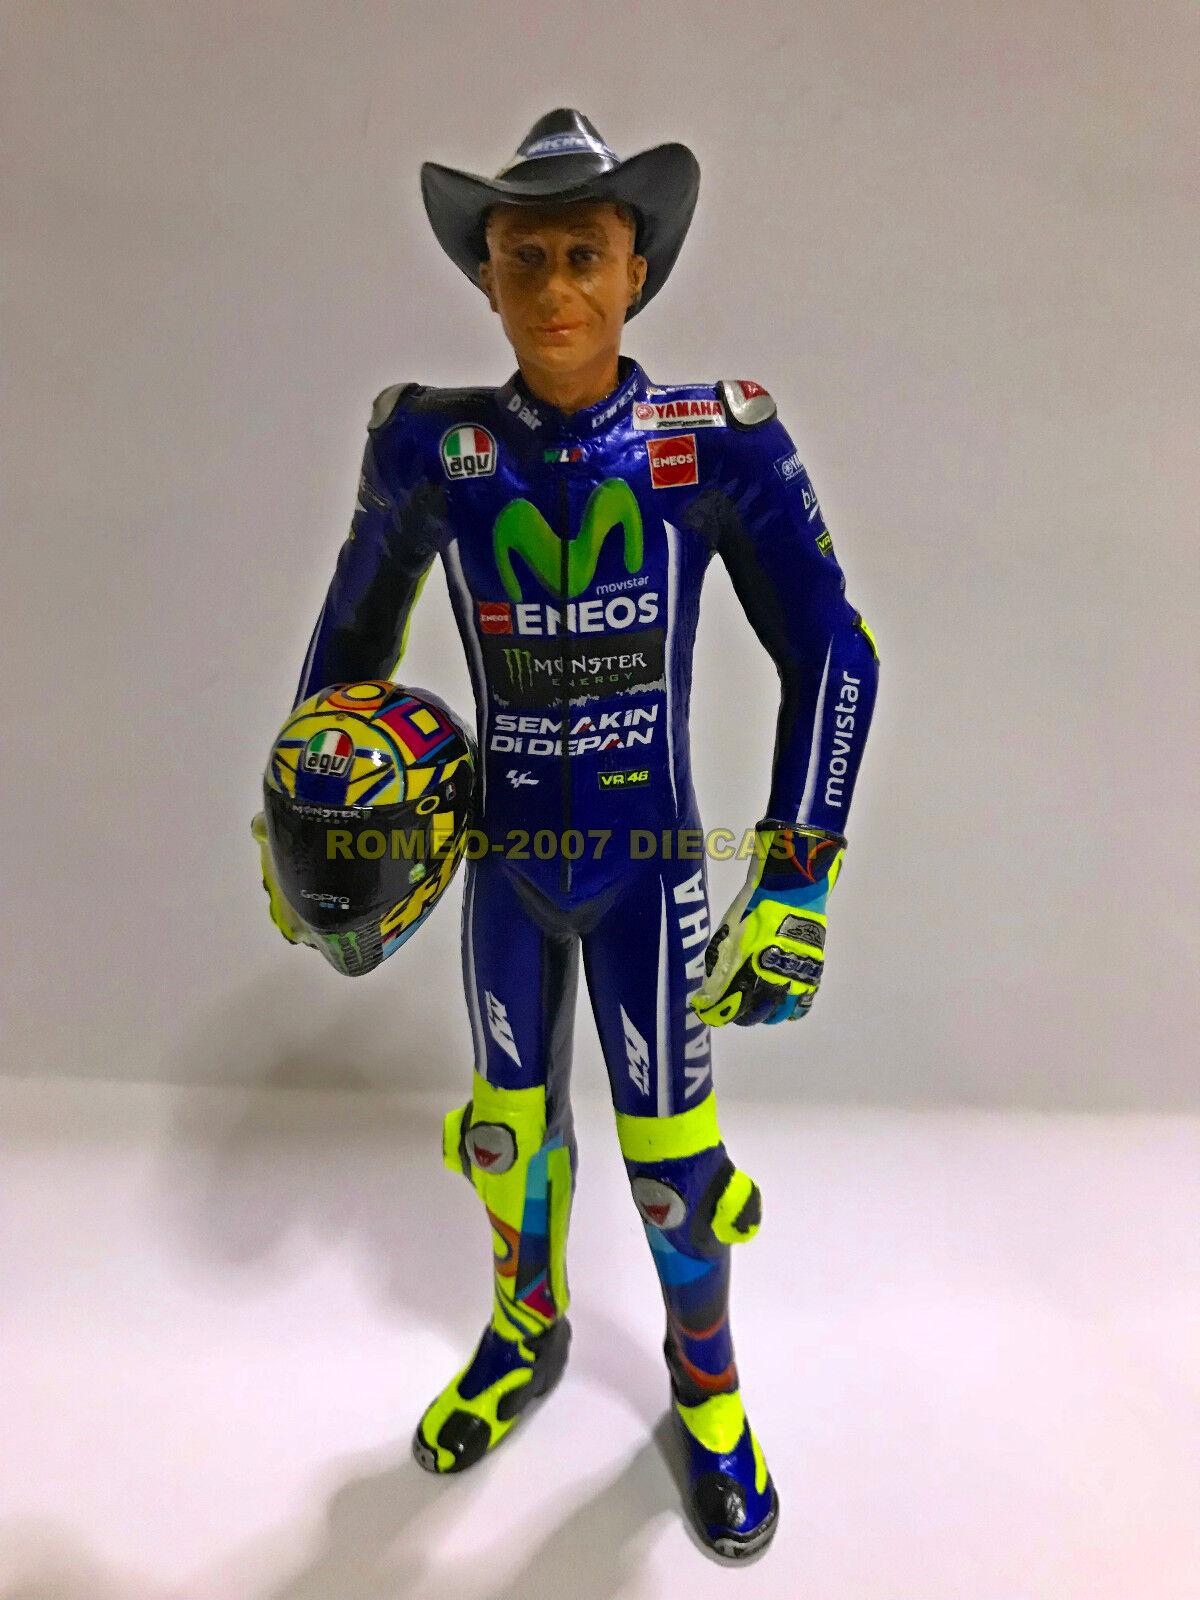 1 12 Conversión Minichamps Figure Figurine Valentino Rossi Austin Austin Austin Texas 2017 NEW d51775